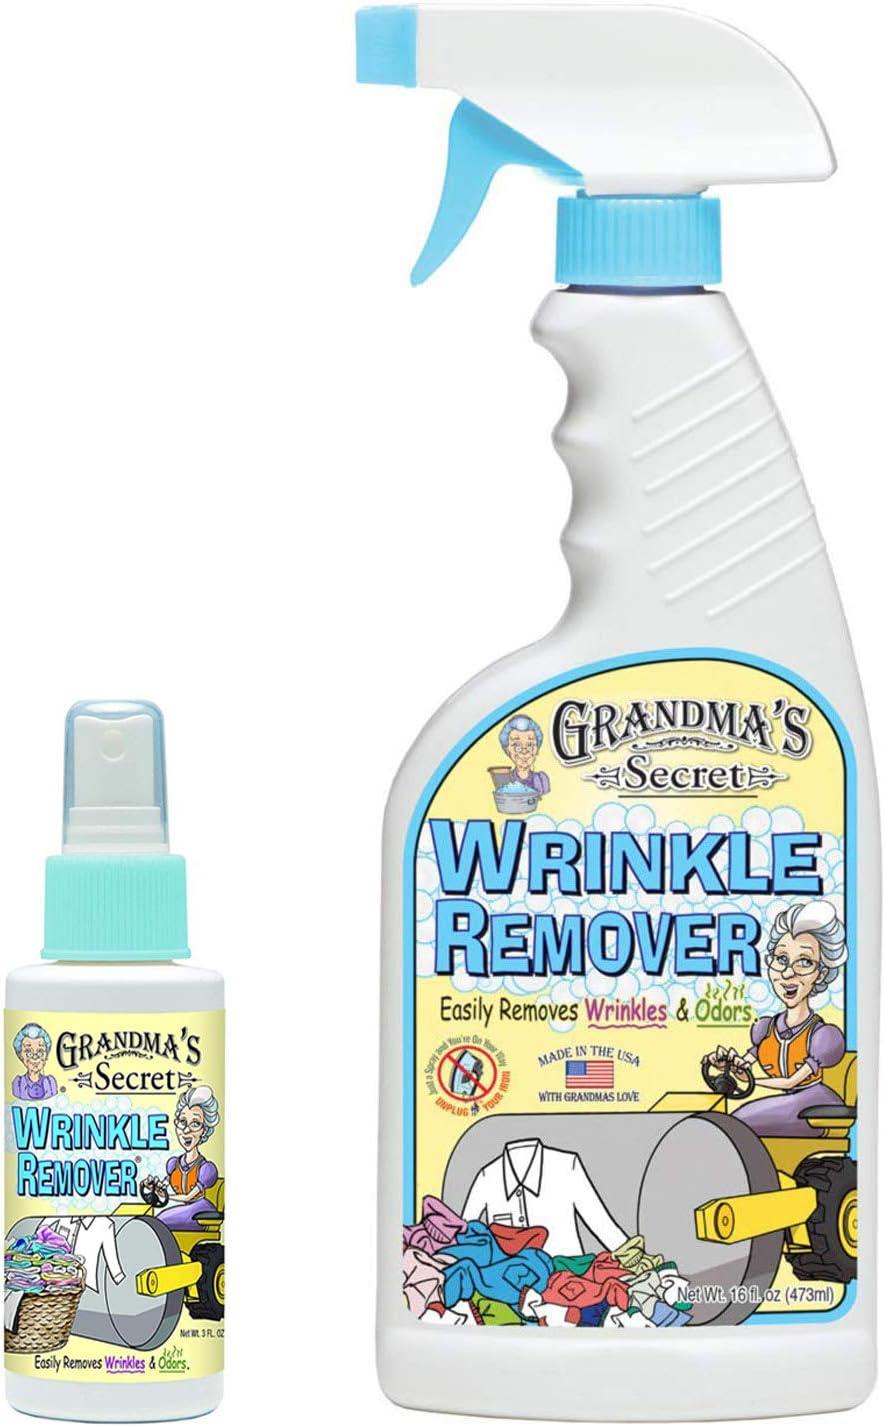 Grandma's Secret Wrinkle & Odor Remover Spray - 16 oz and 3 oz Travel Size Combo